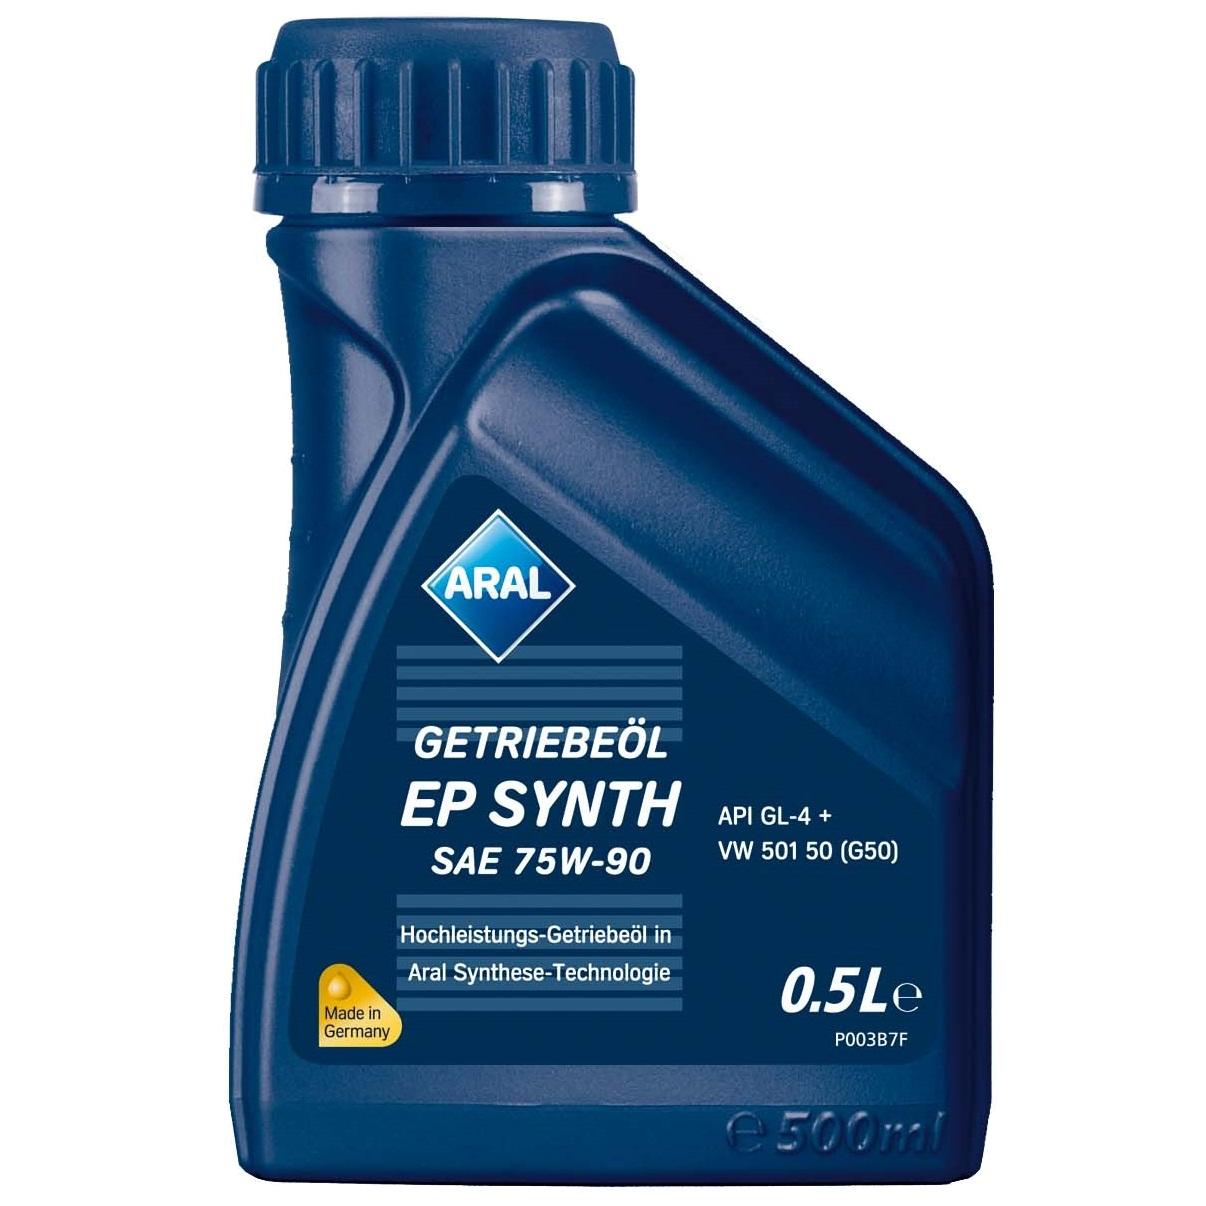 Ulei pentru cutie viteze manuala Aral Ep Synth SAE 75W-90 500ml